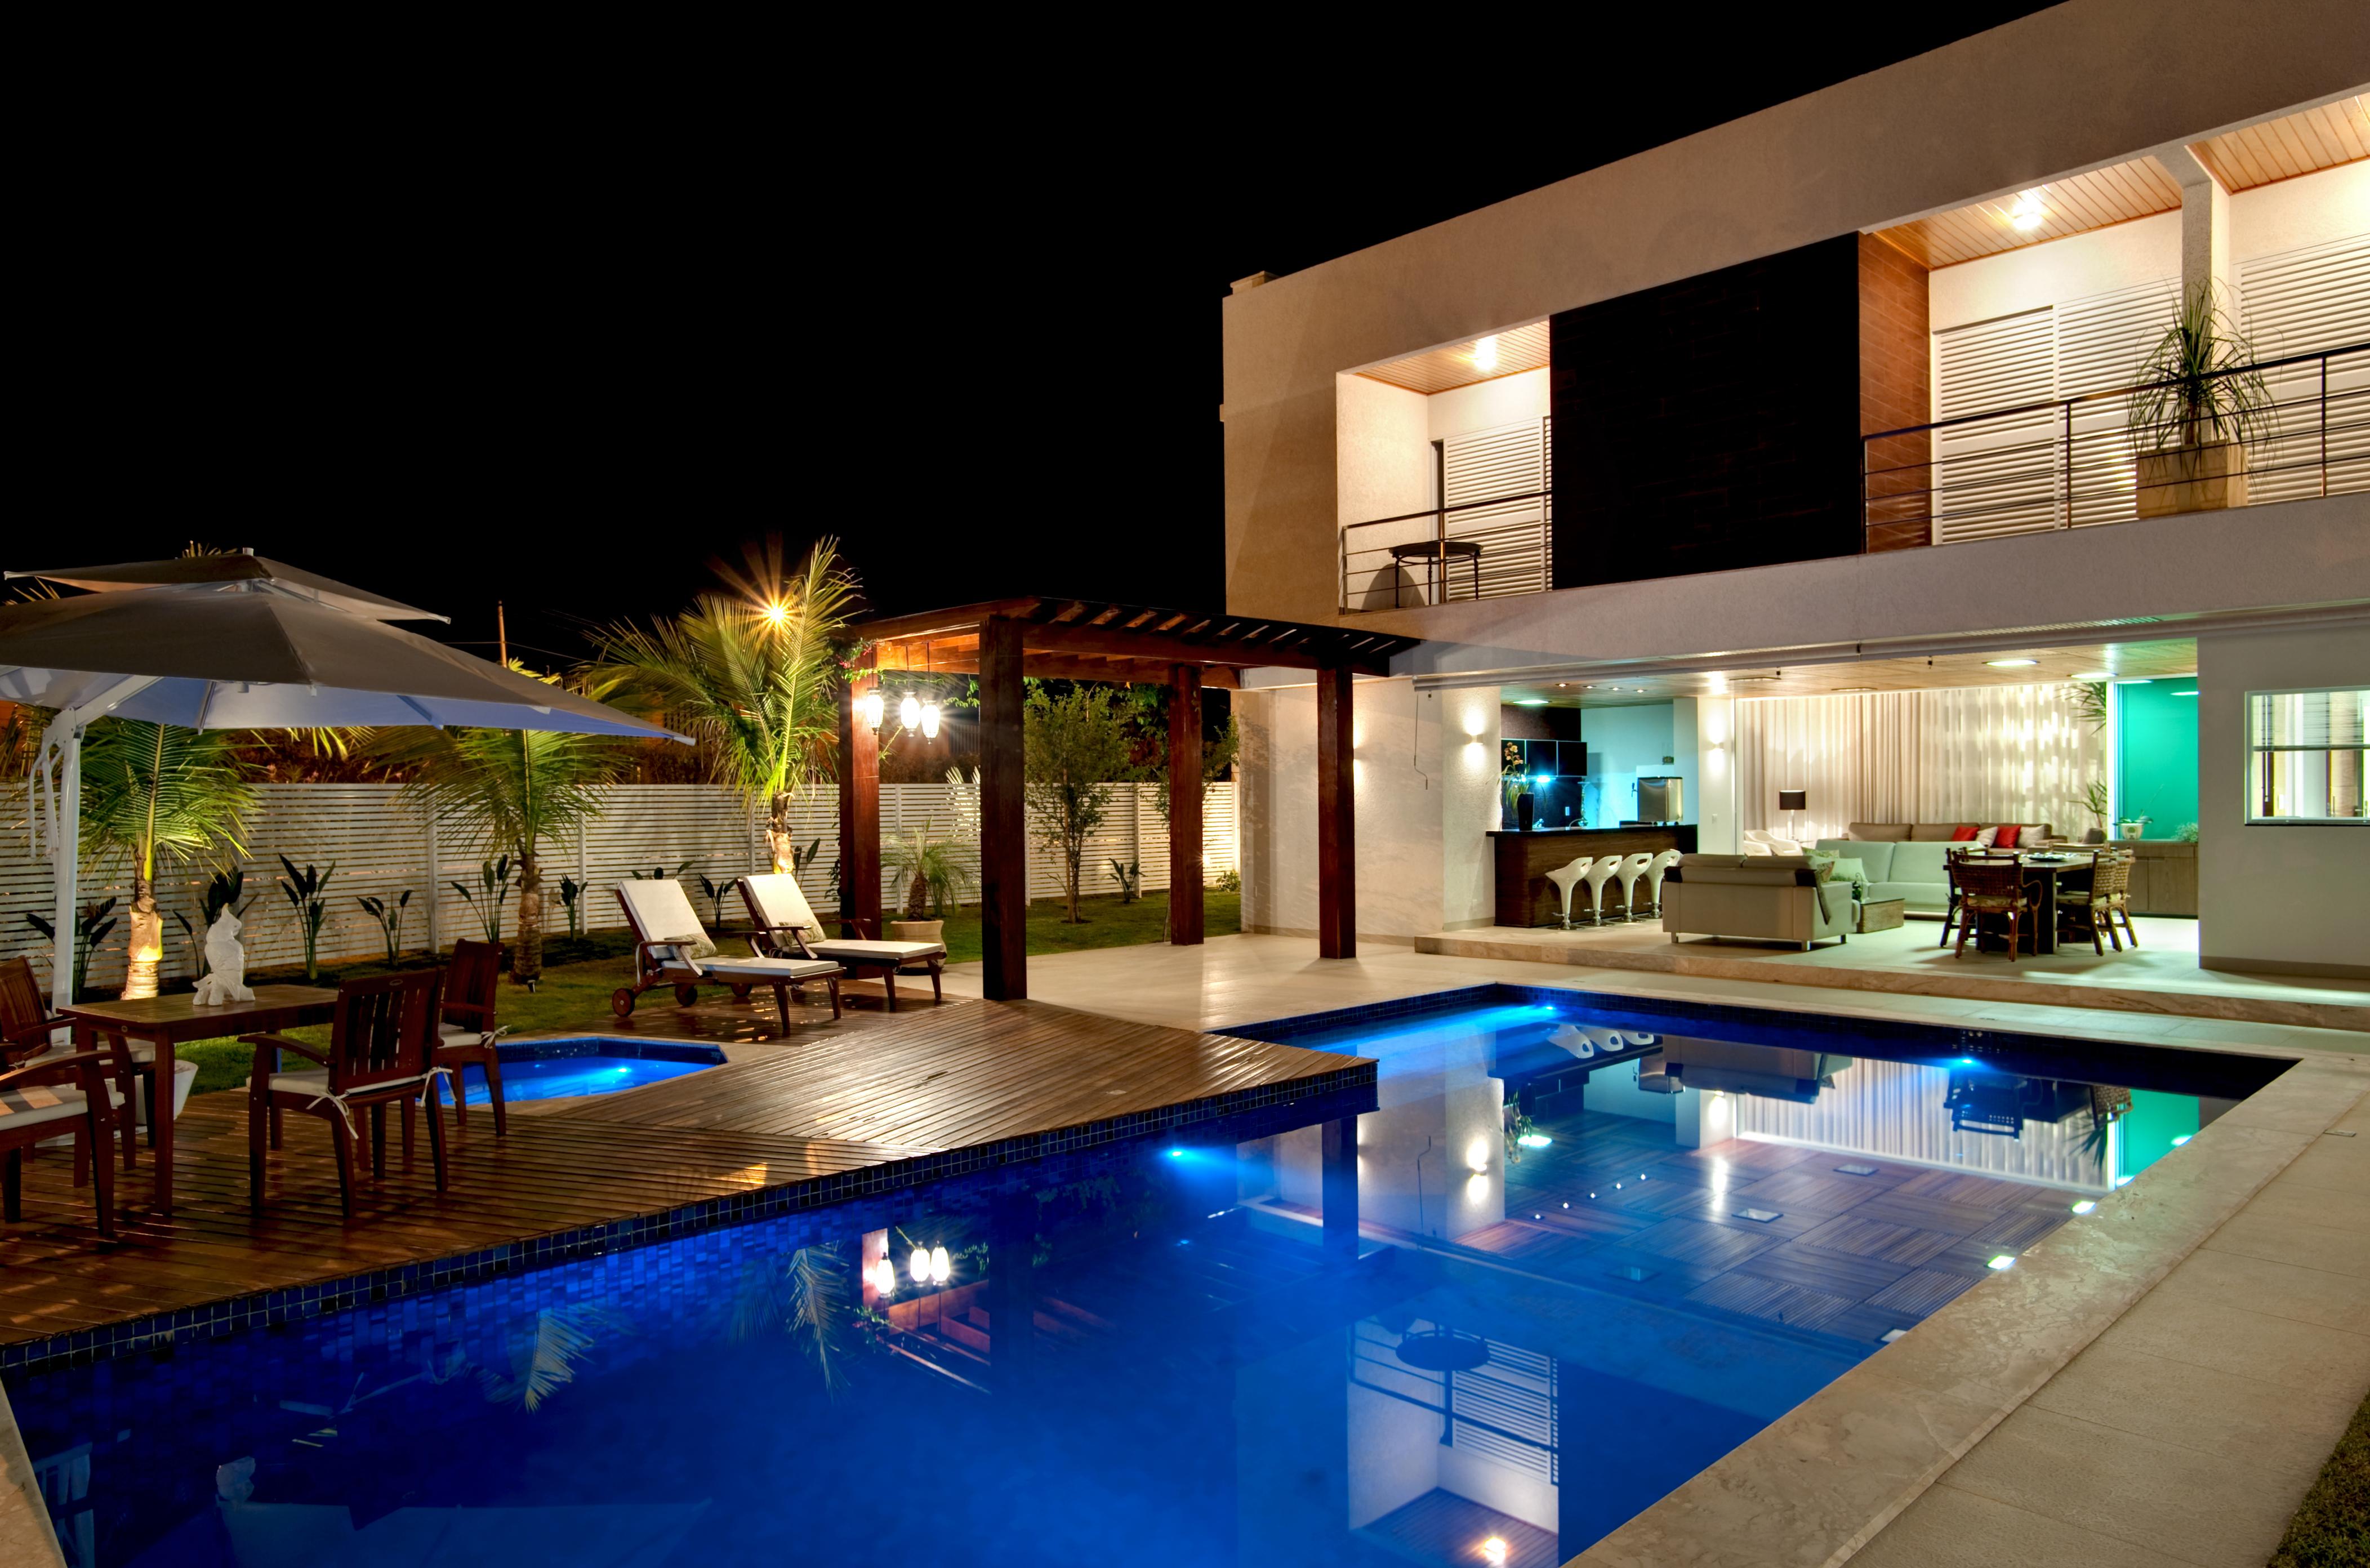 Casa Atenas 038 / Dayala + Rafael Arquitetura, © Leandro Moura estúdio onzeonze